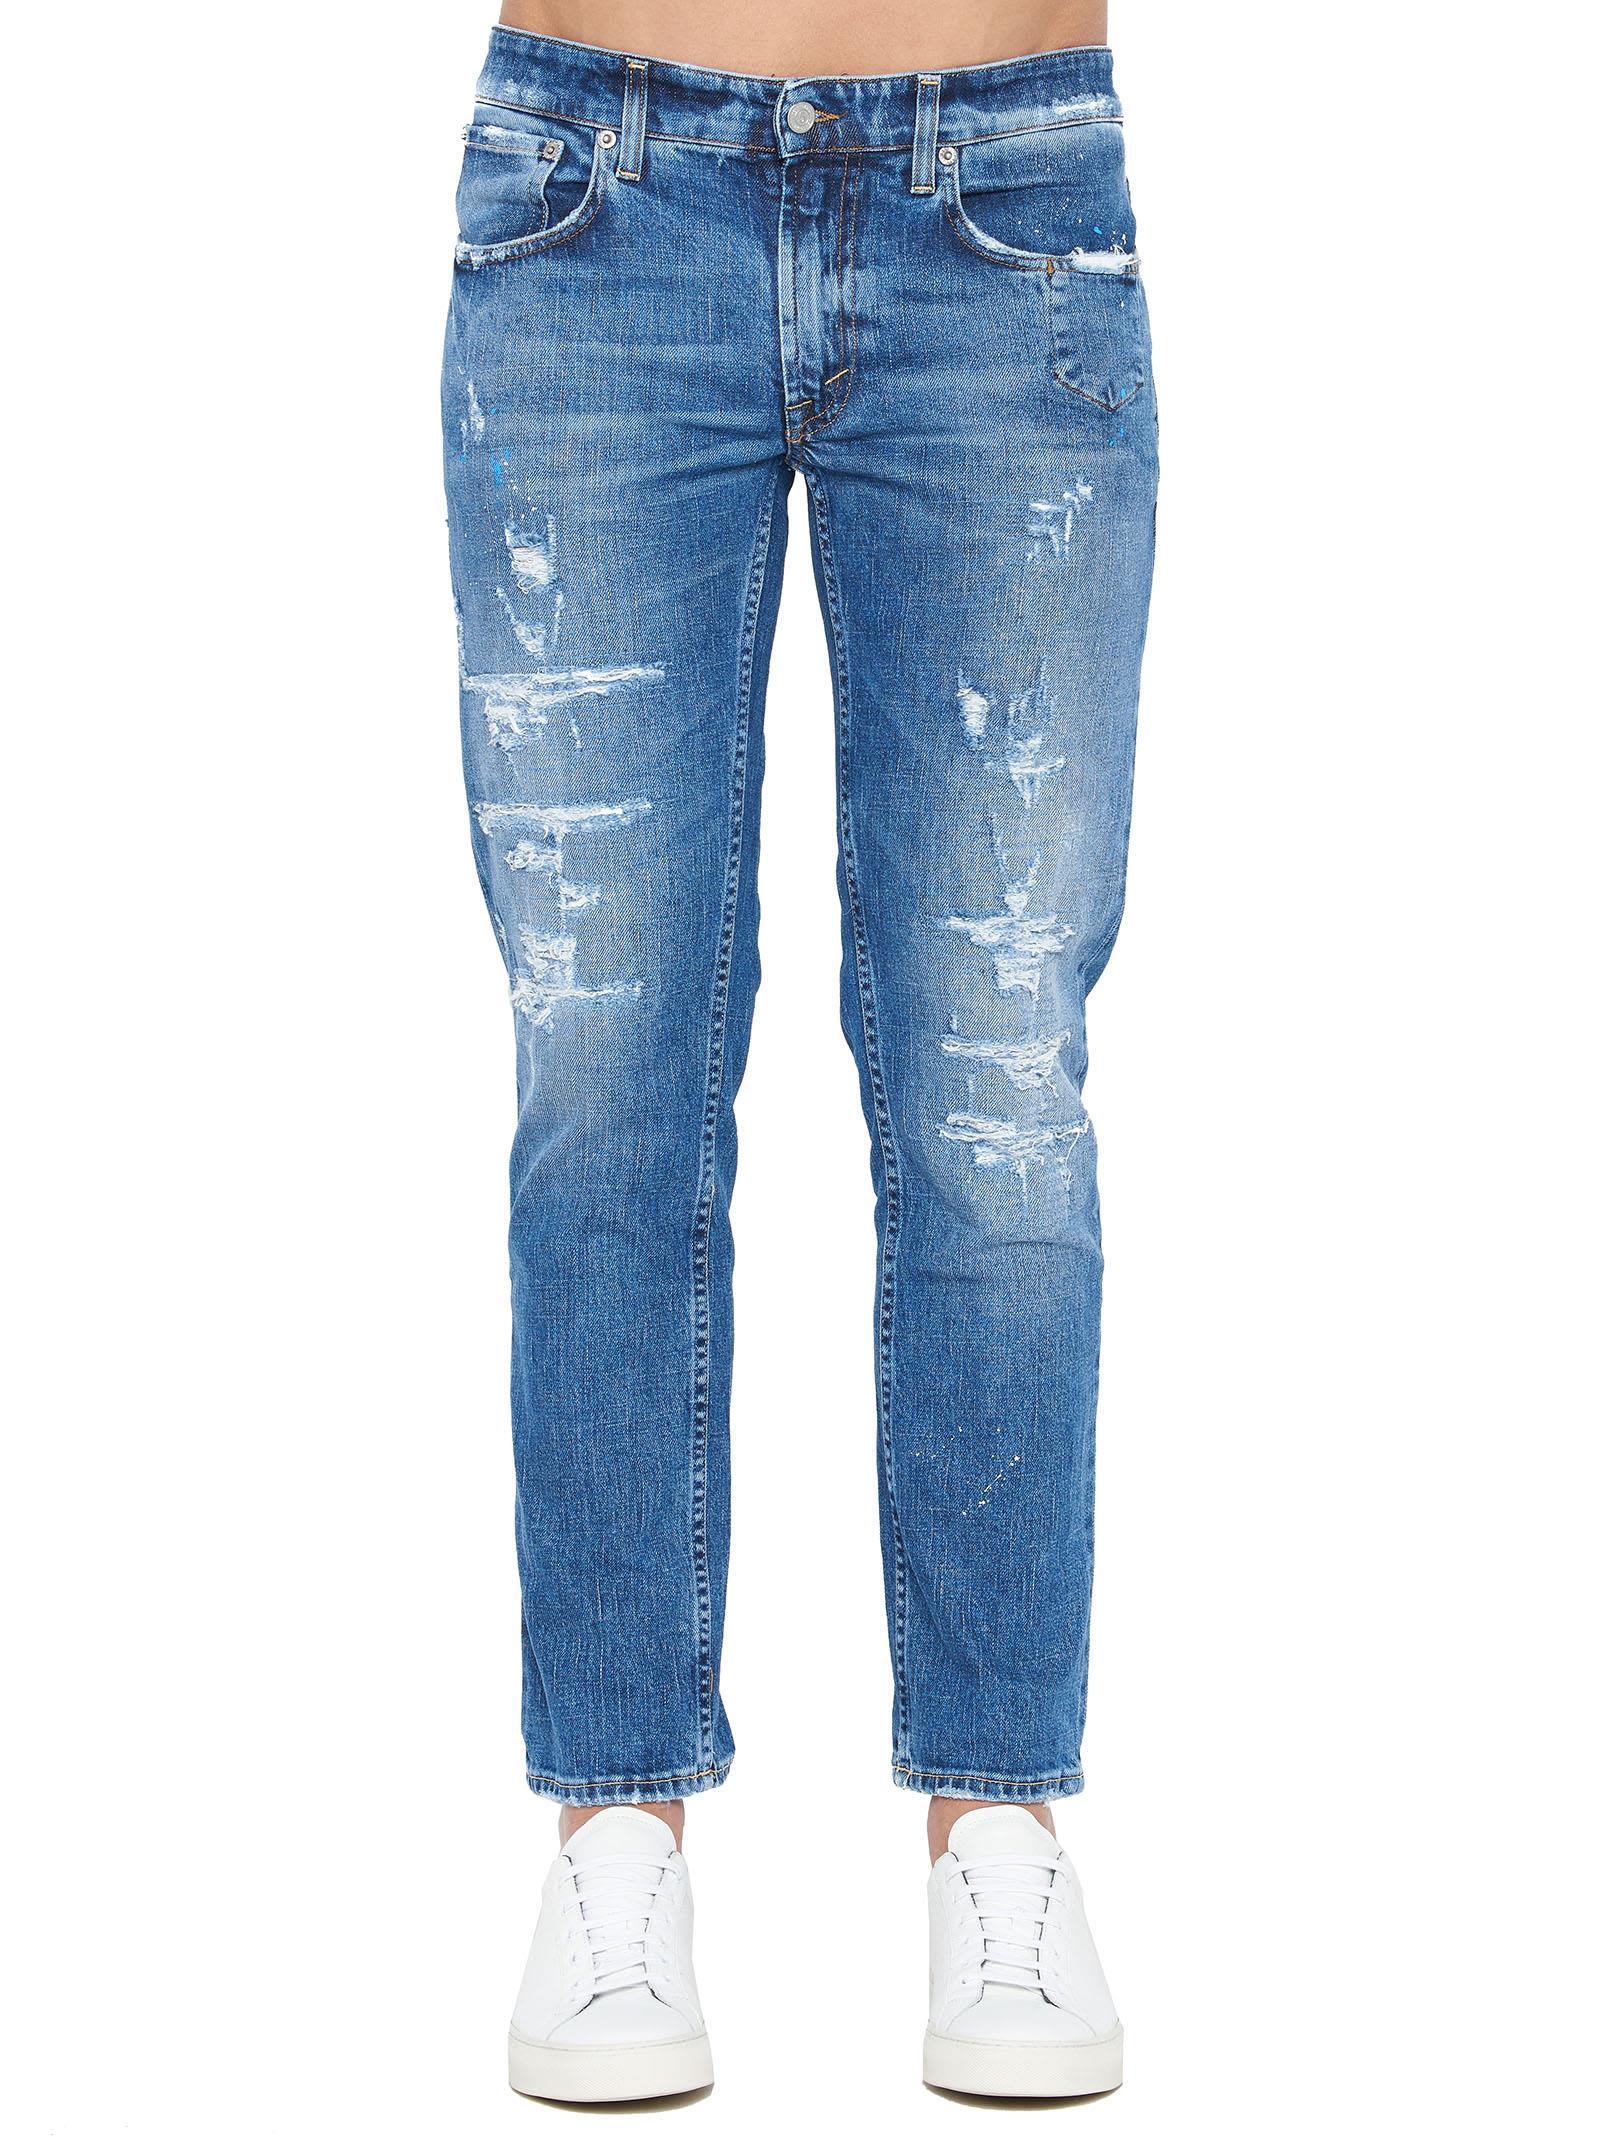 Department 5 Jeans 10528186